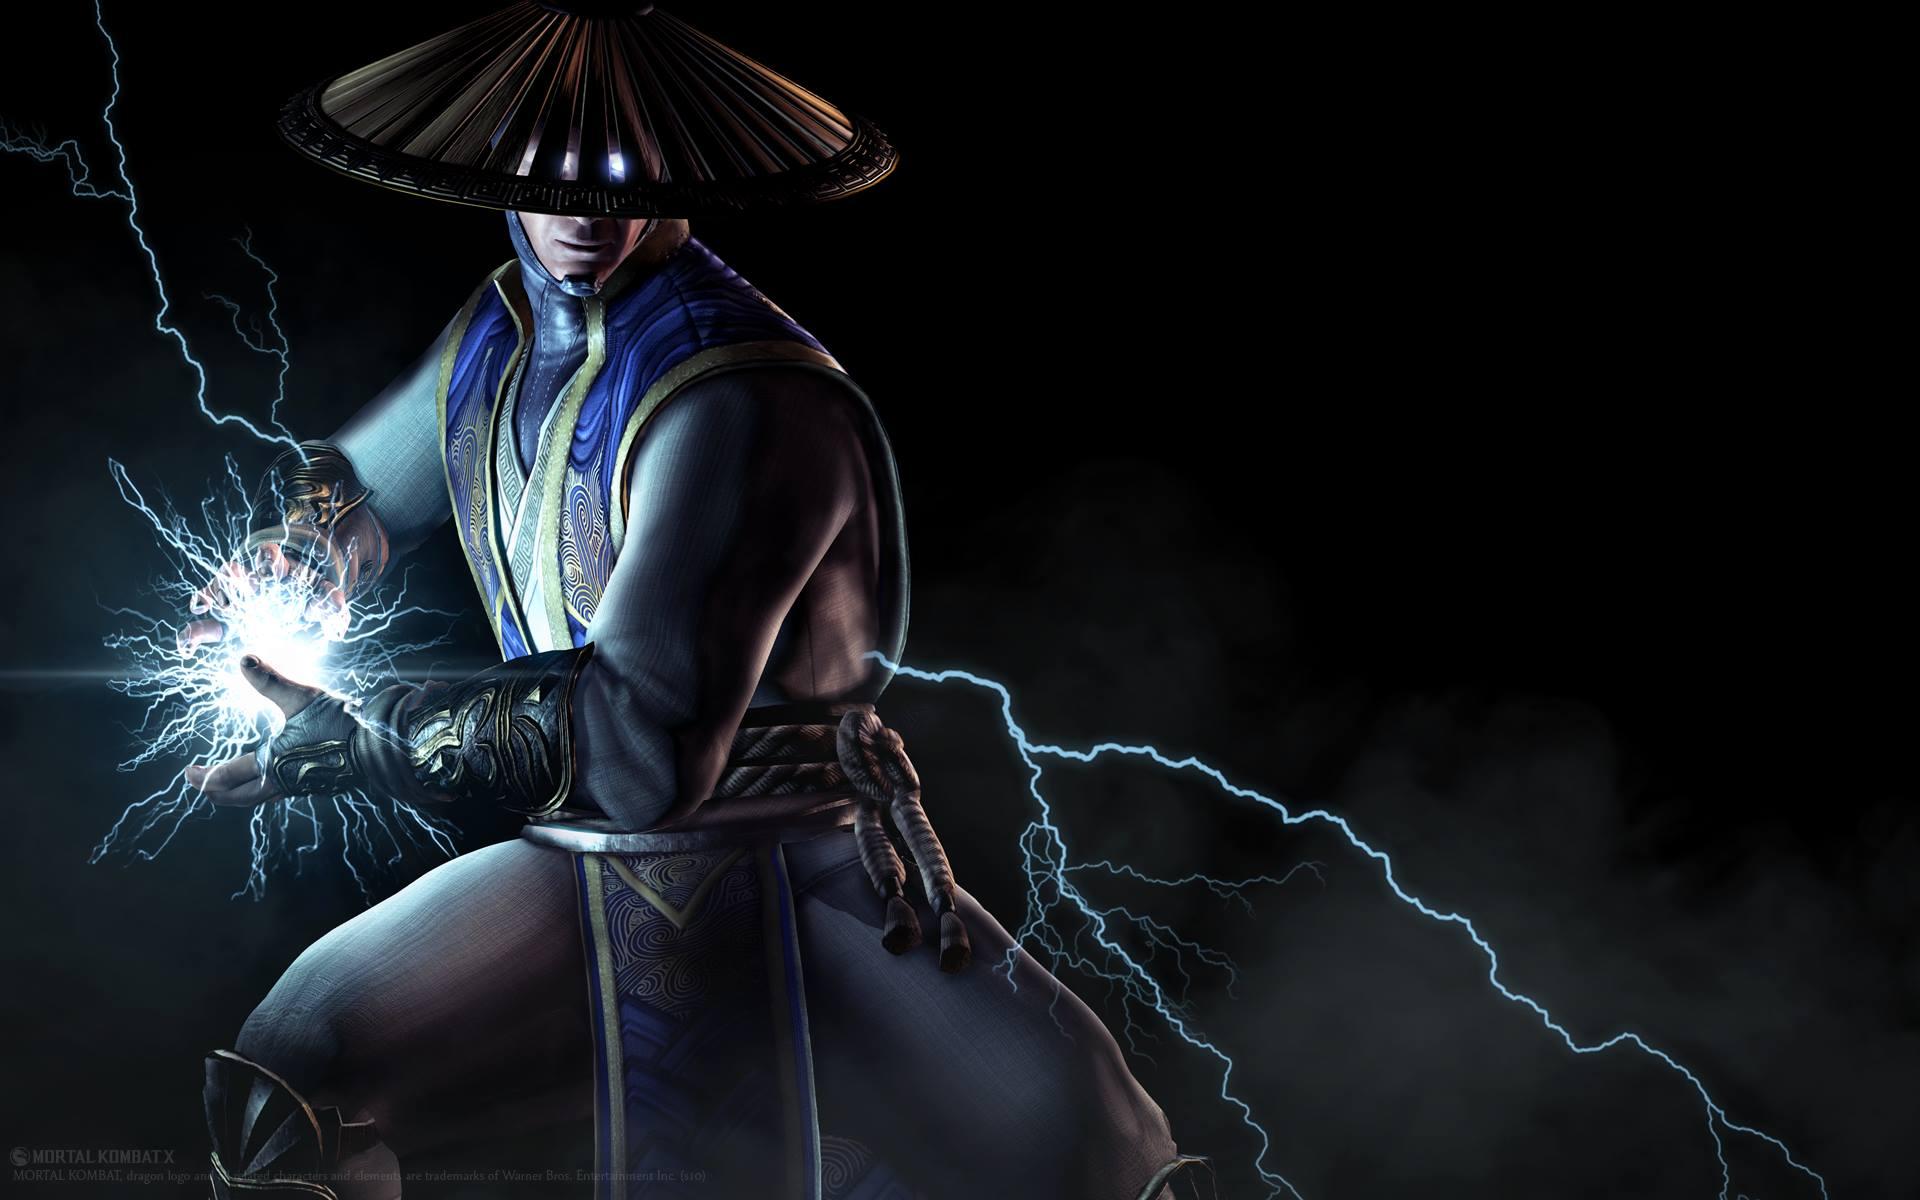 Mortal Kombat X Wallpapers: Mortal Kombat X Raiden Wallpaper